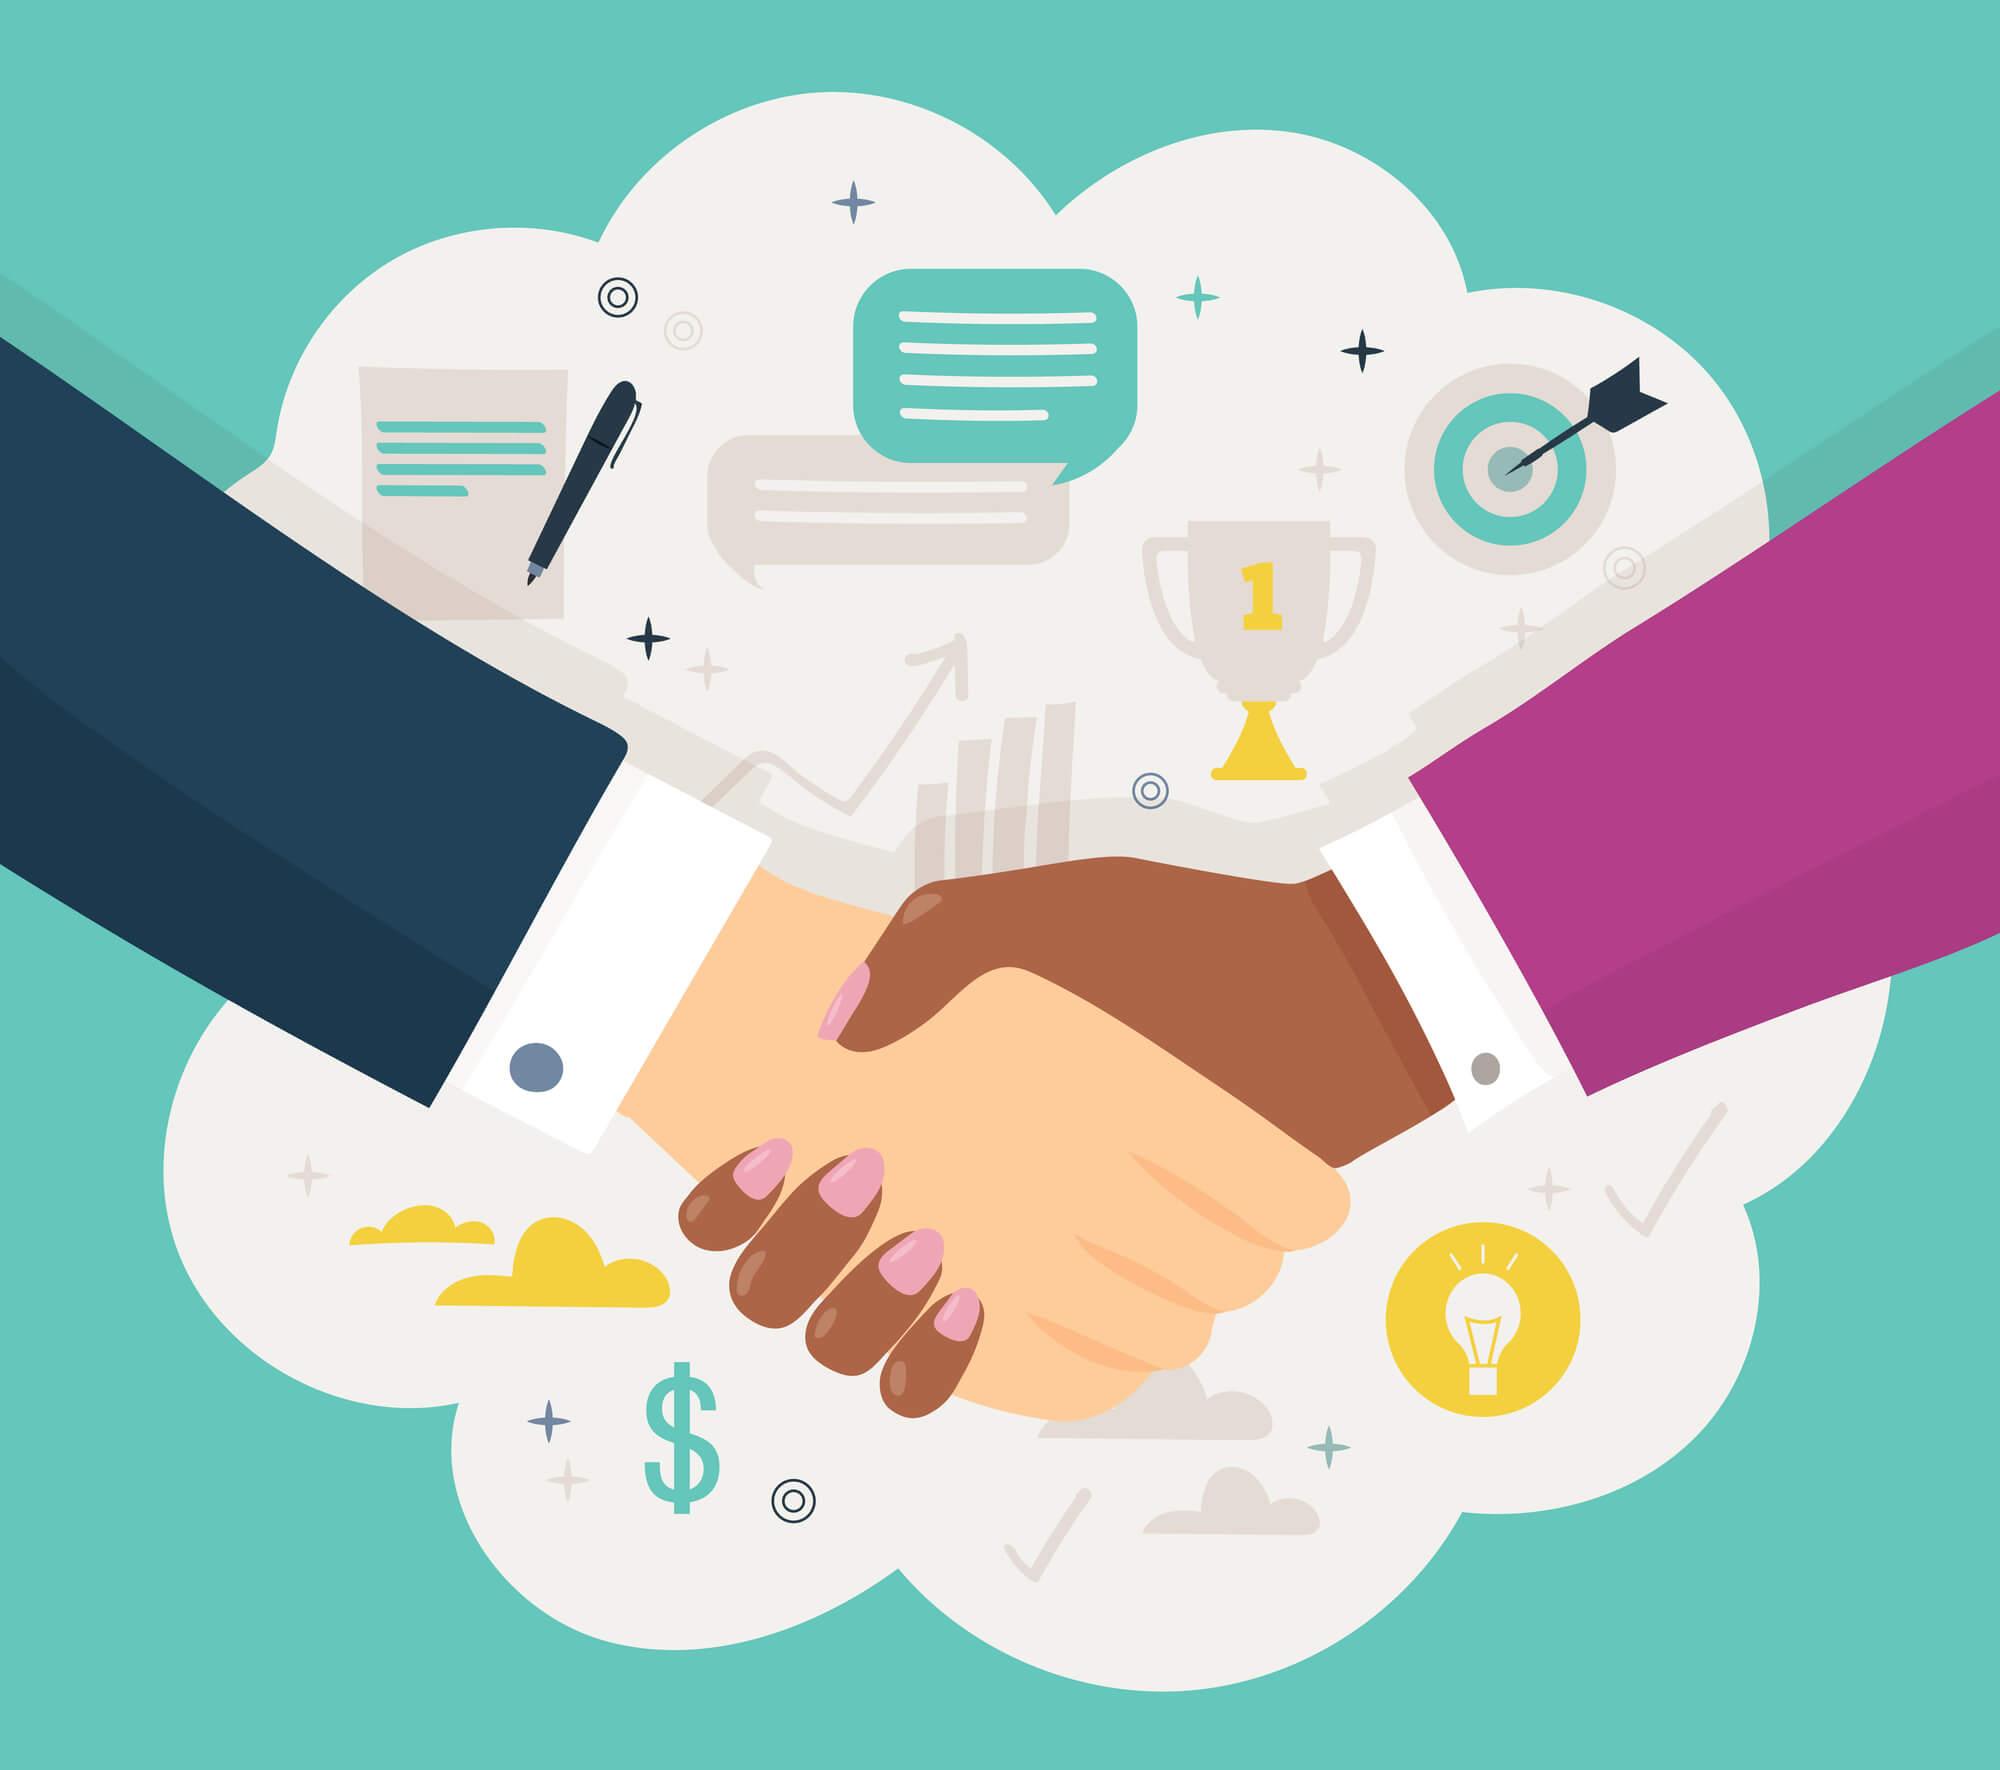 professional-handshake-to-work-together